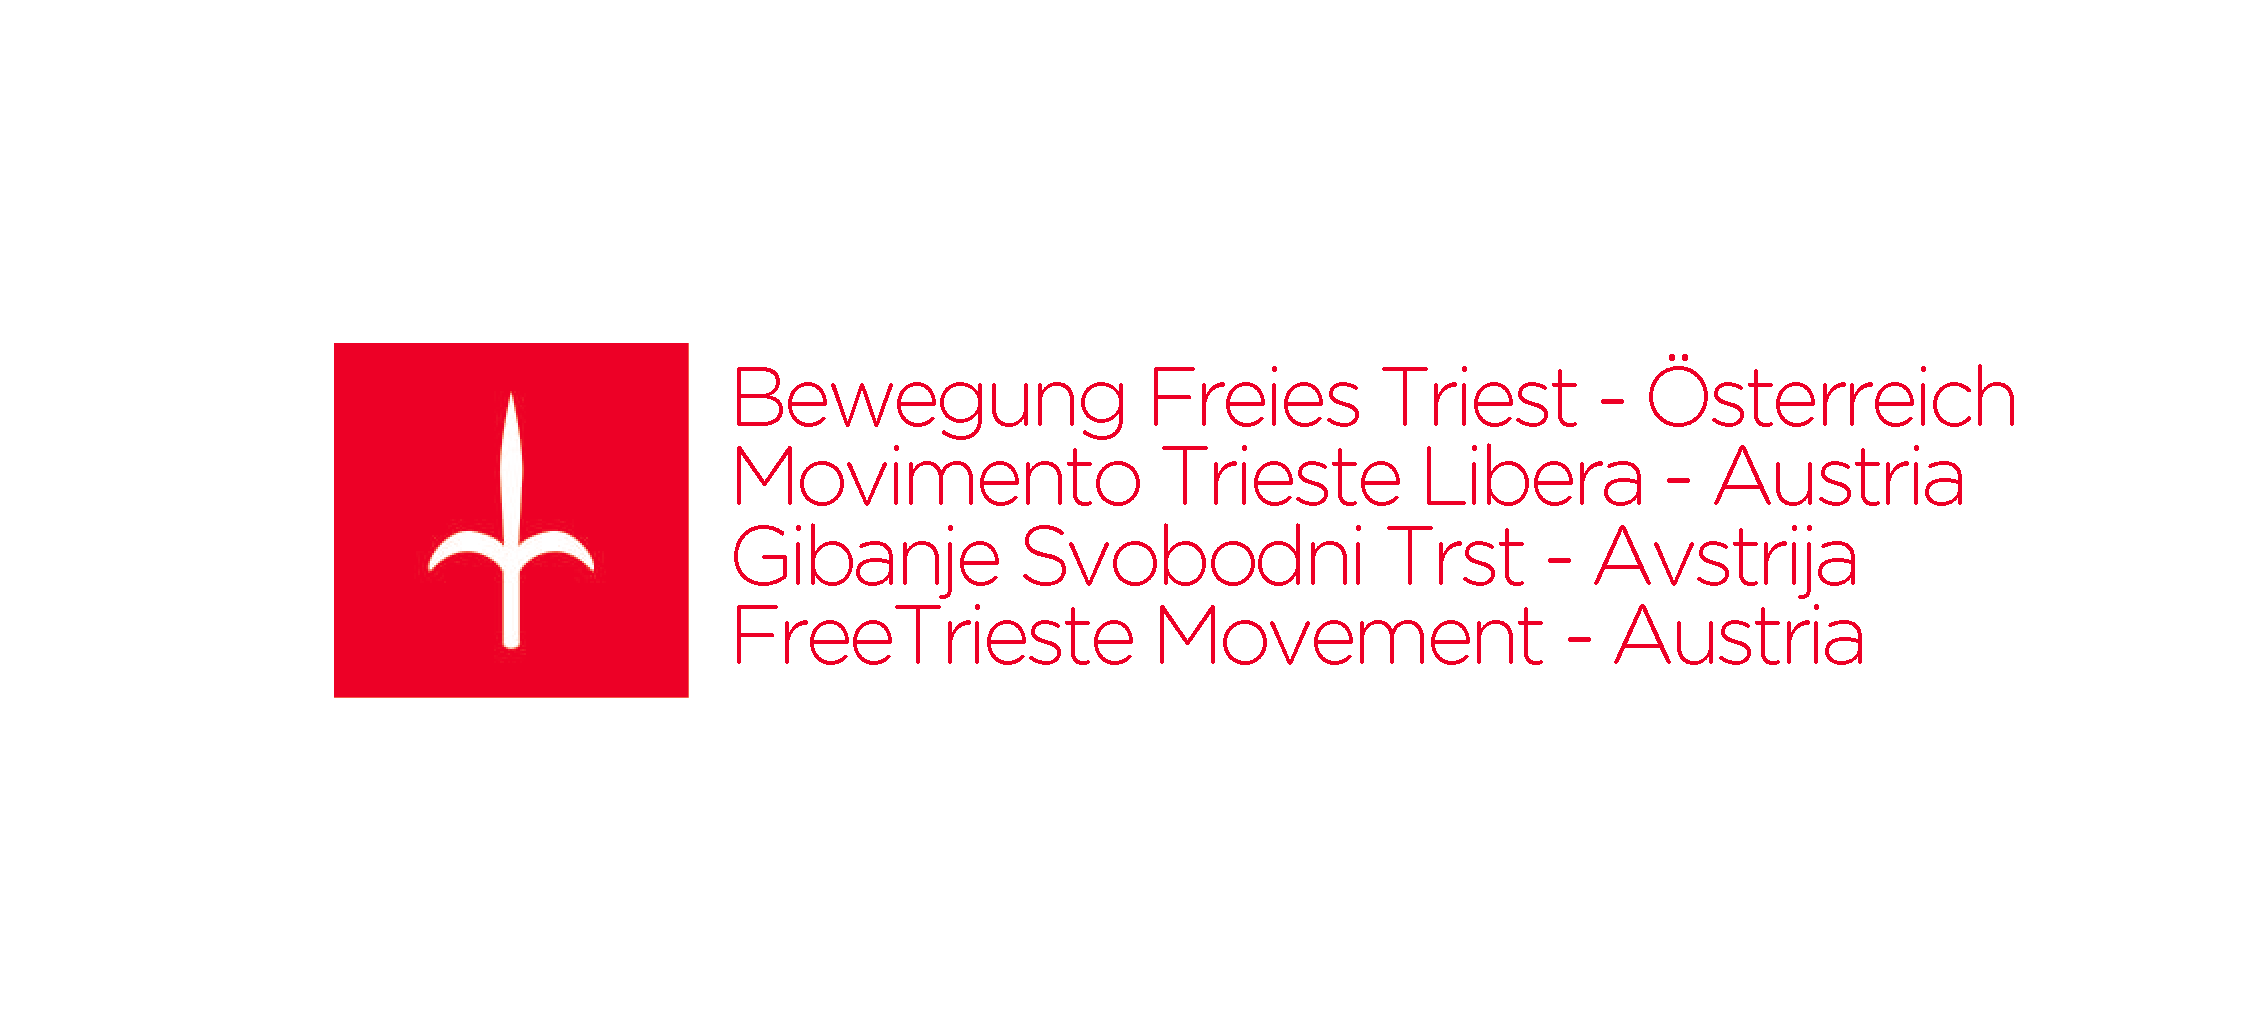 BFT-Austria